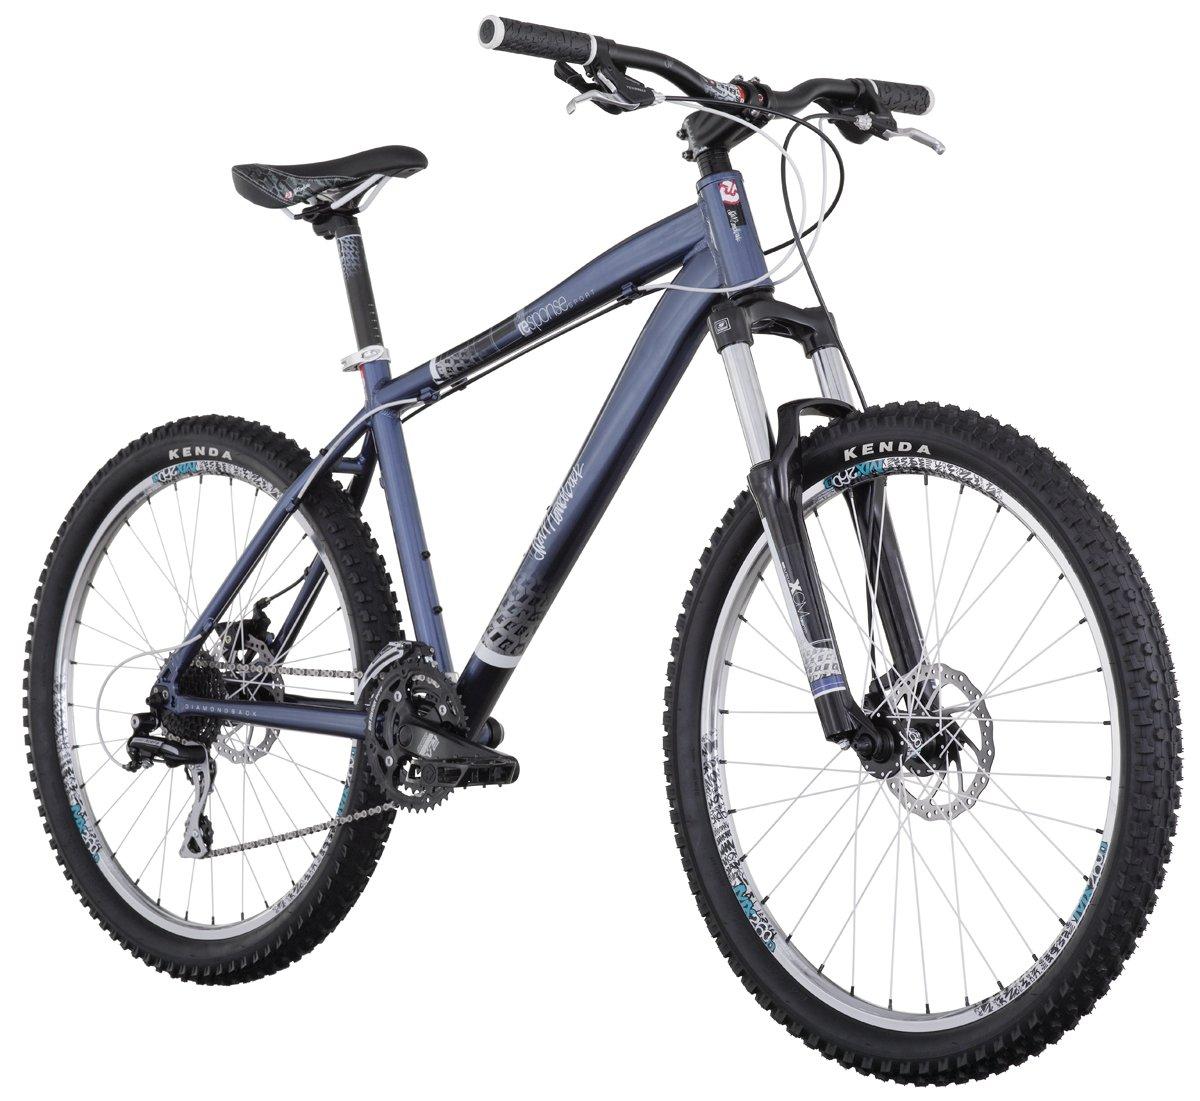 7660785b356 Amazon.com : Diamondback Response Sport Mountain Bike (26-Inch Wheels),  Matte Blue, X-Large/22-Inch : Sports & Outdoors